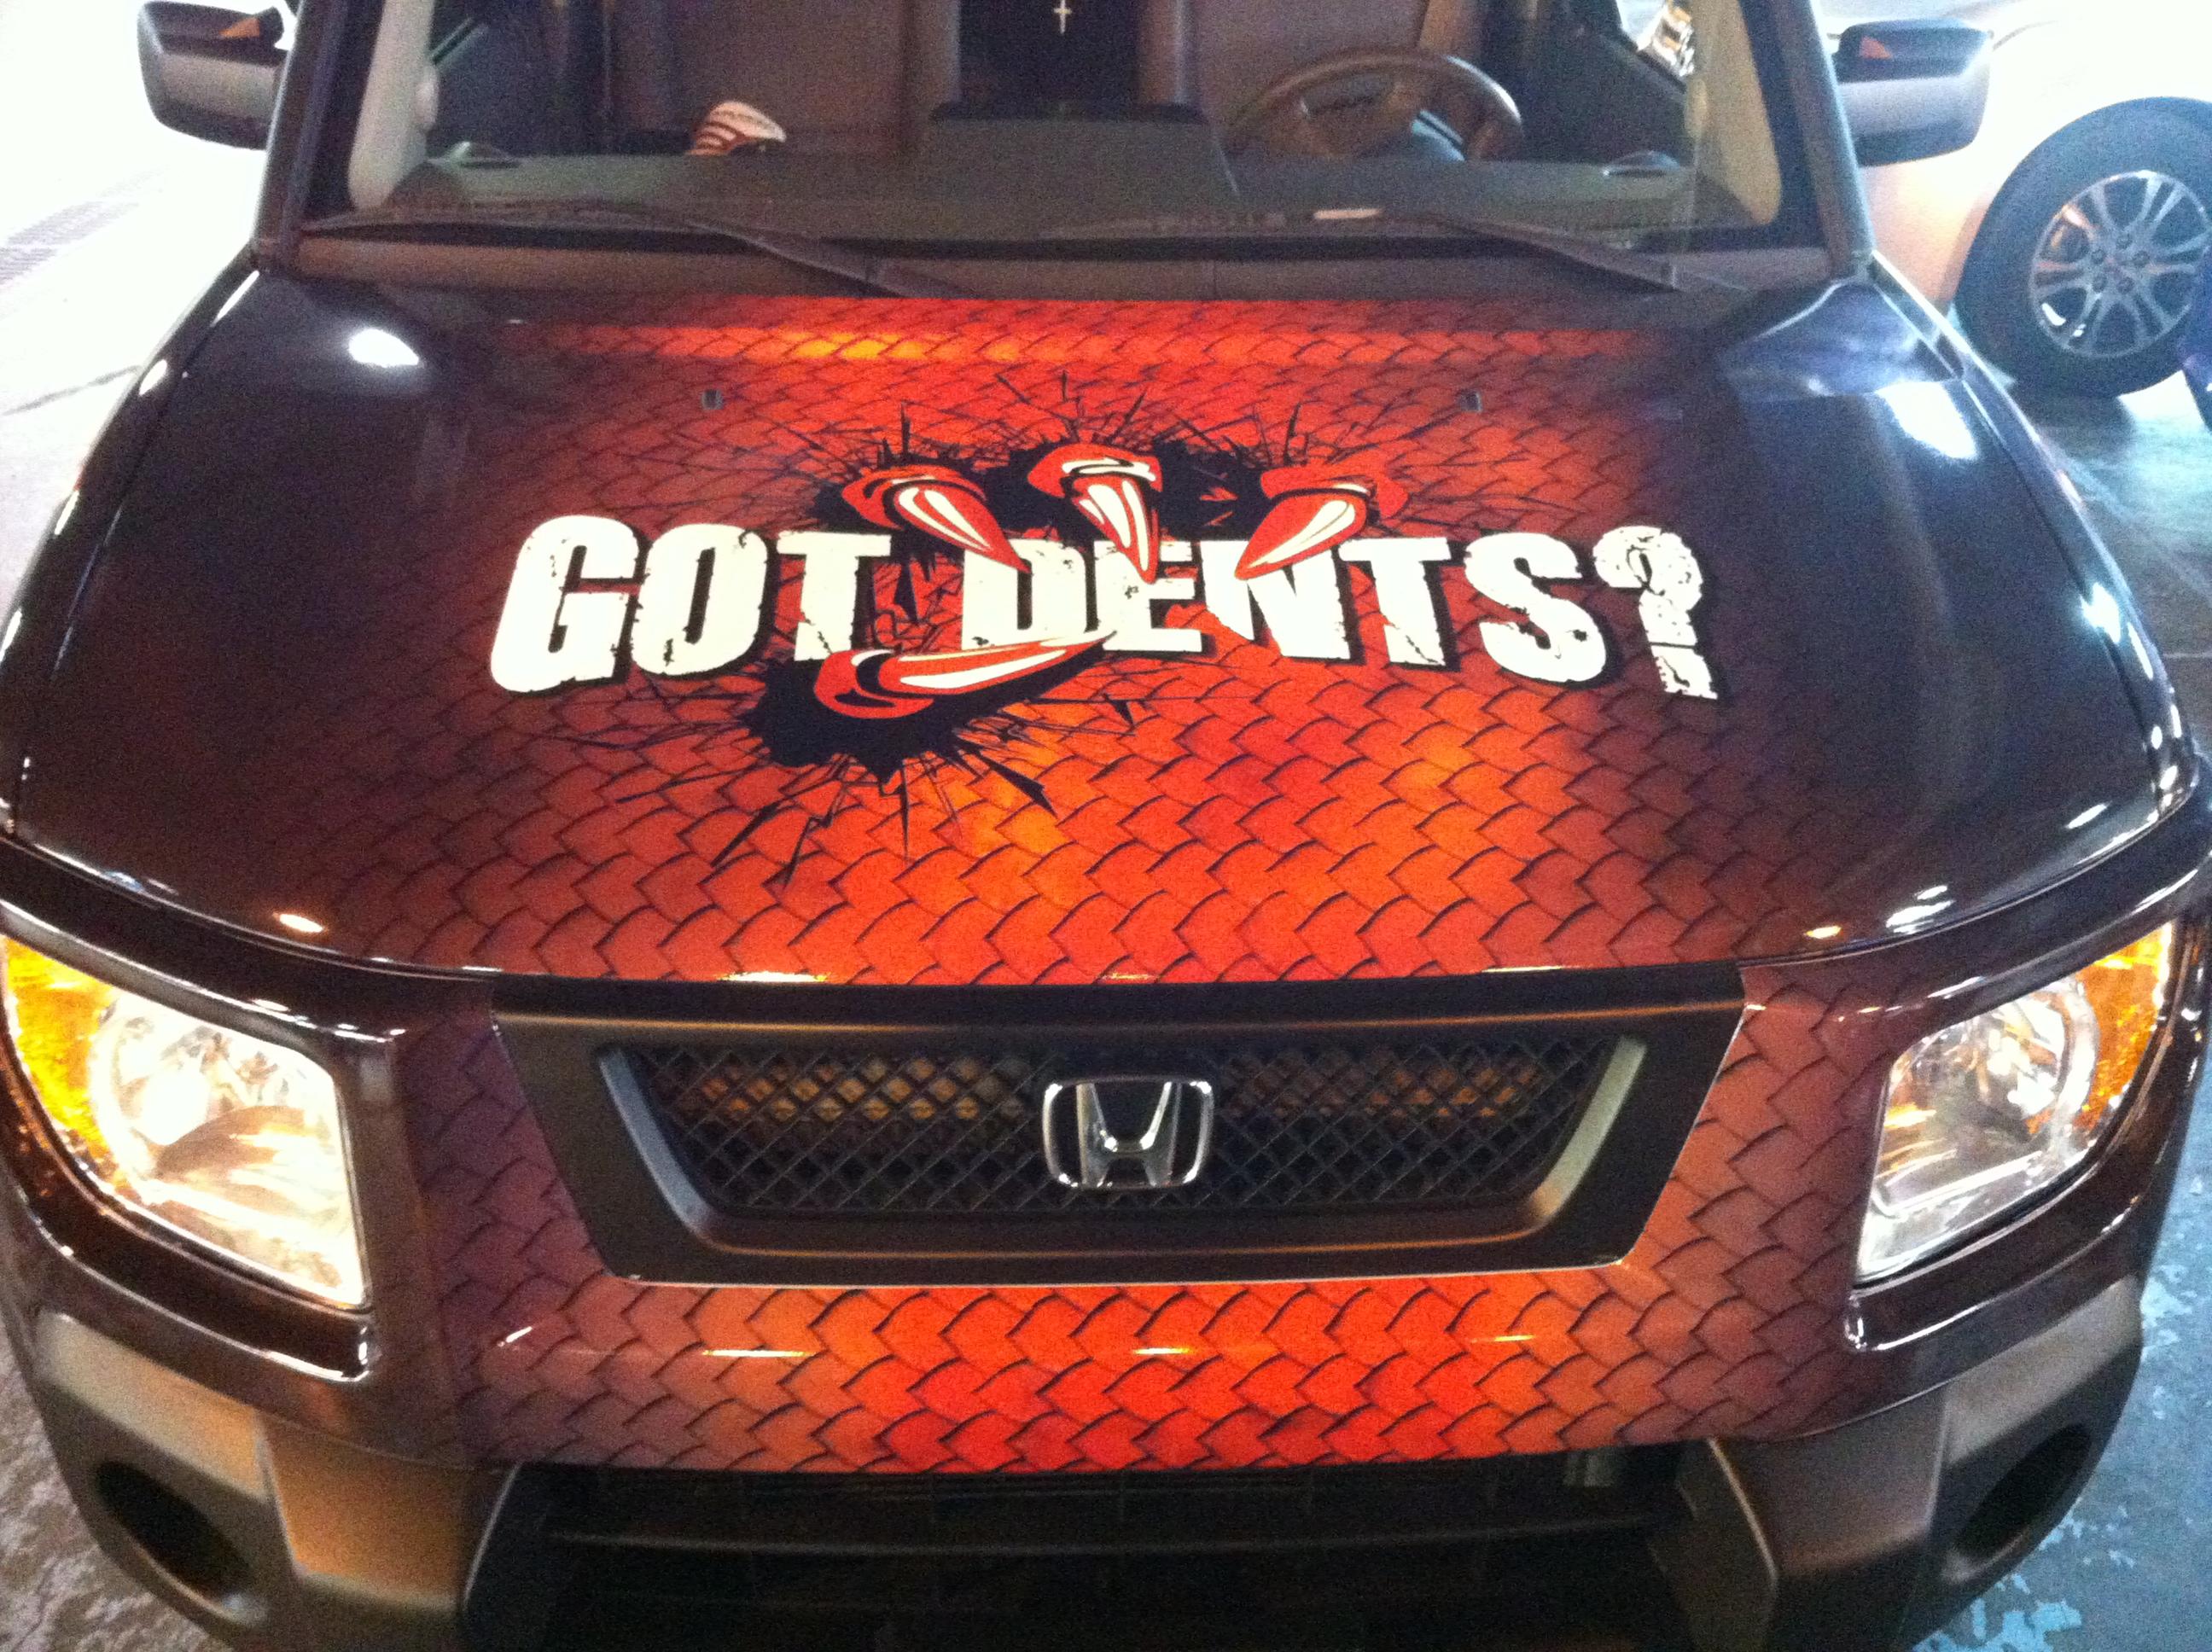 Indianapolis Dent Company - ad image